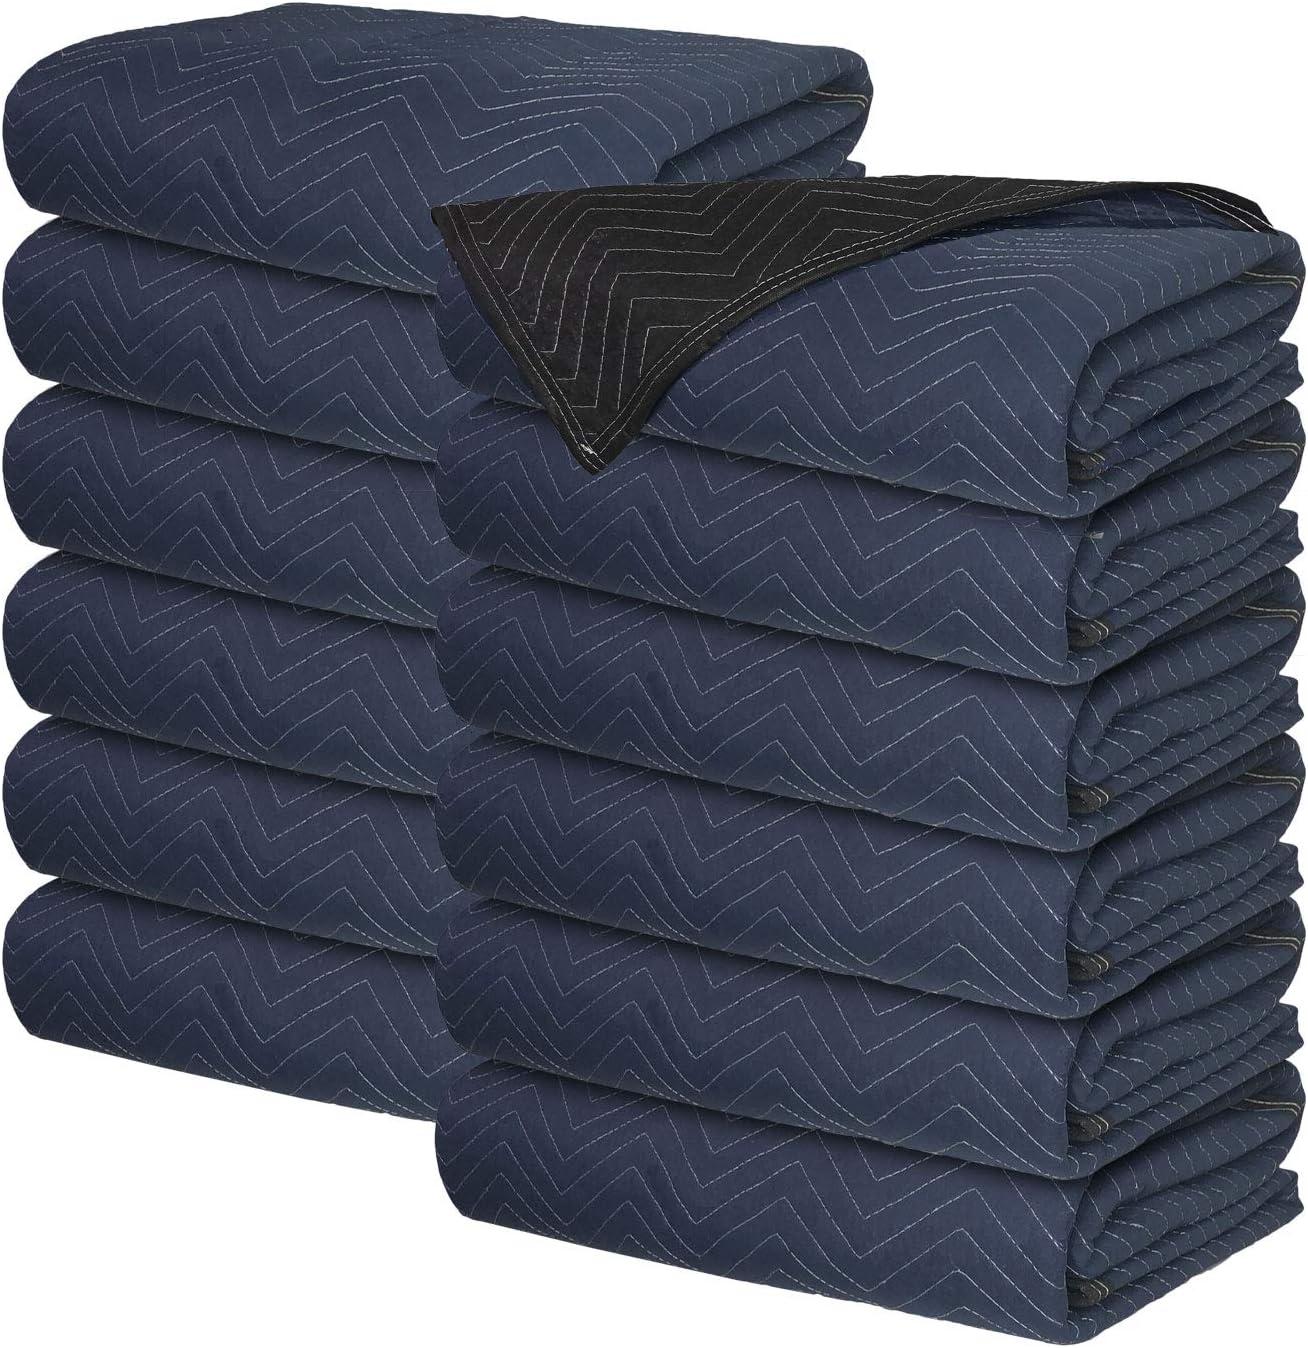 Pro Blankets Moving Blankets Furniture Hardware pubfactor.ma